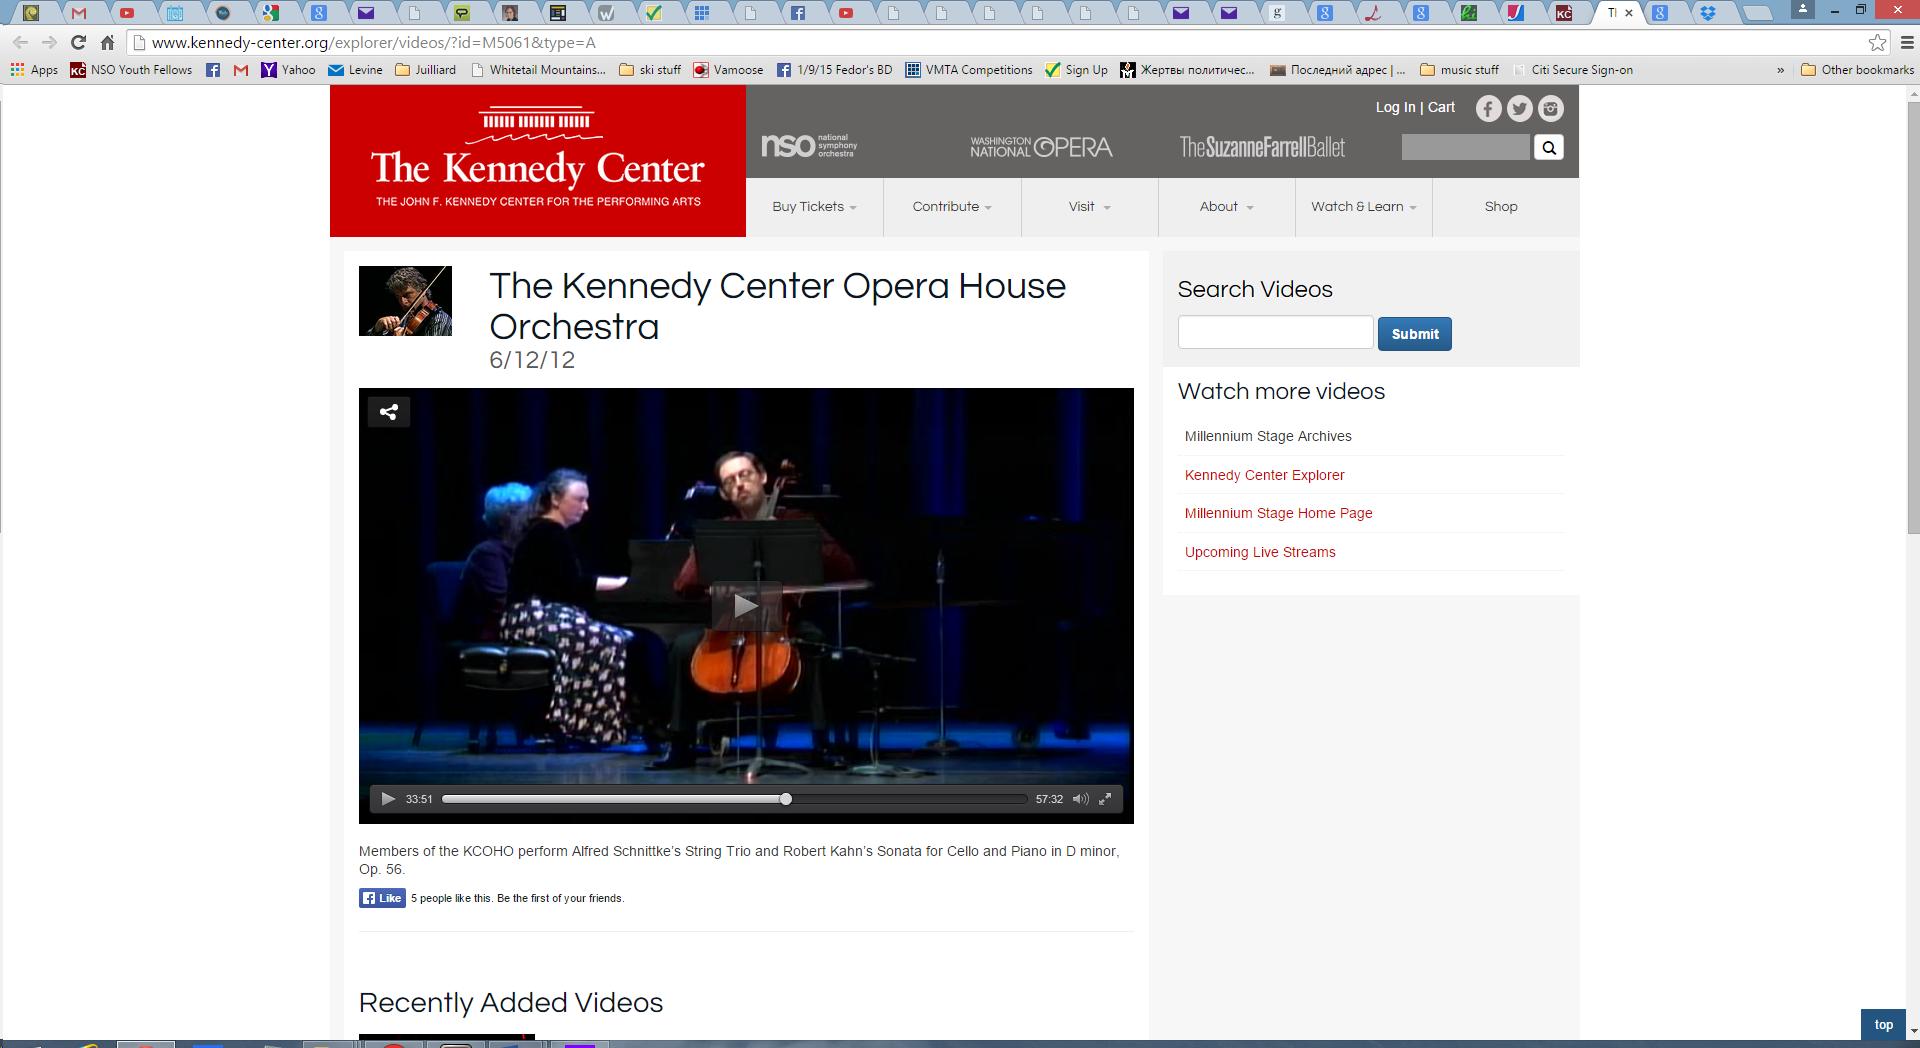 Kennedy Kahn Sonata